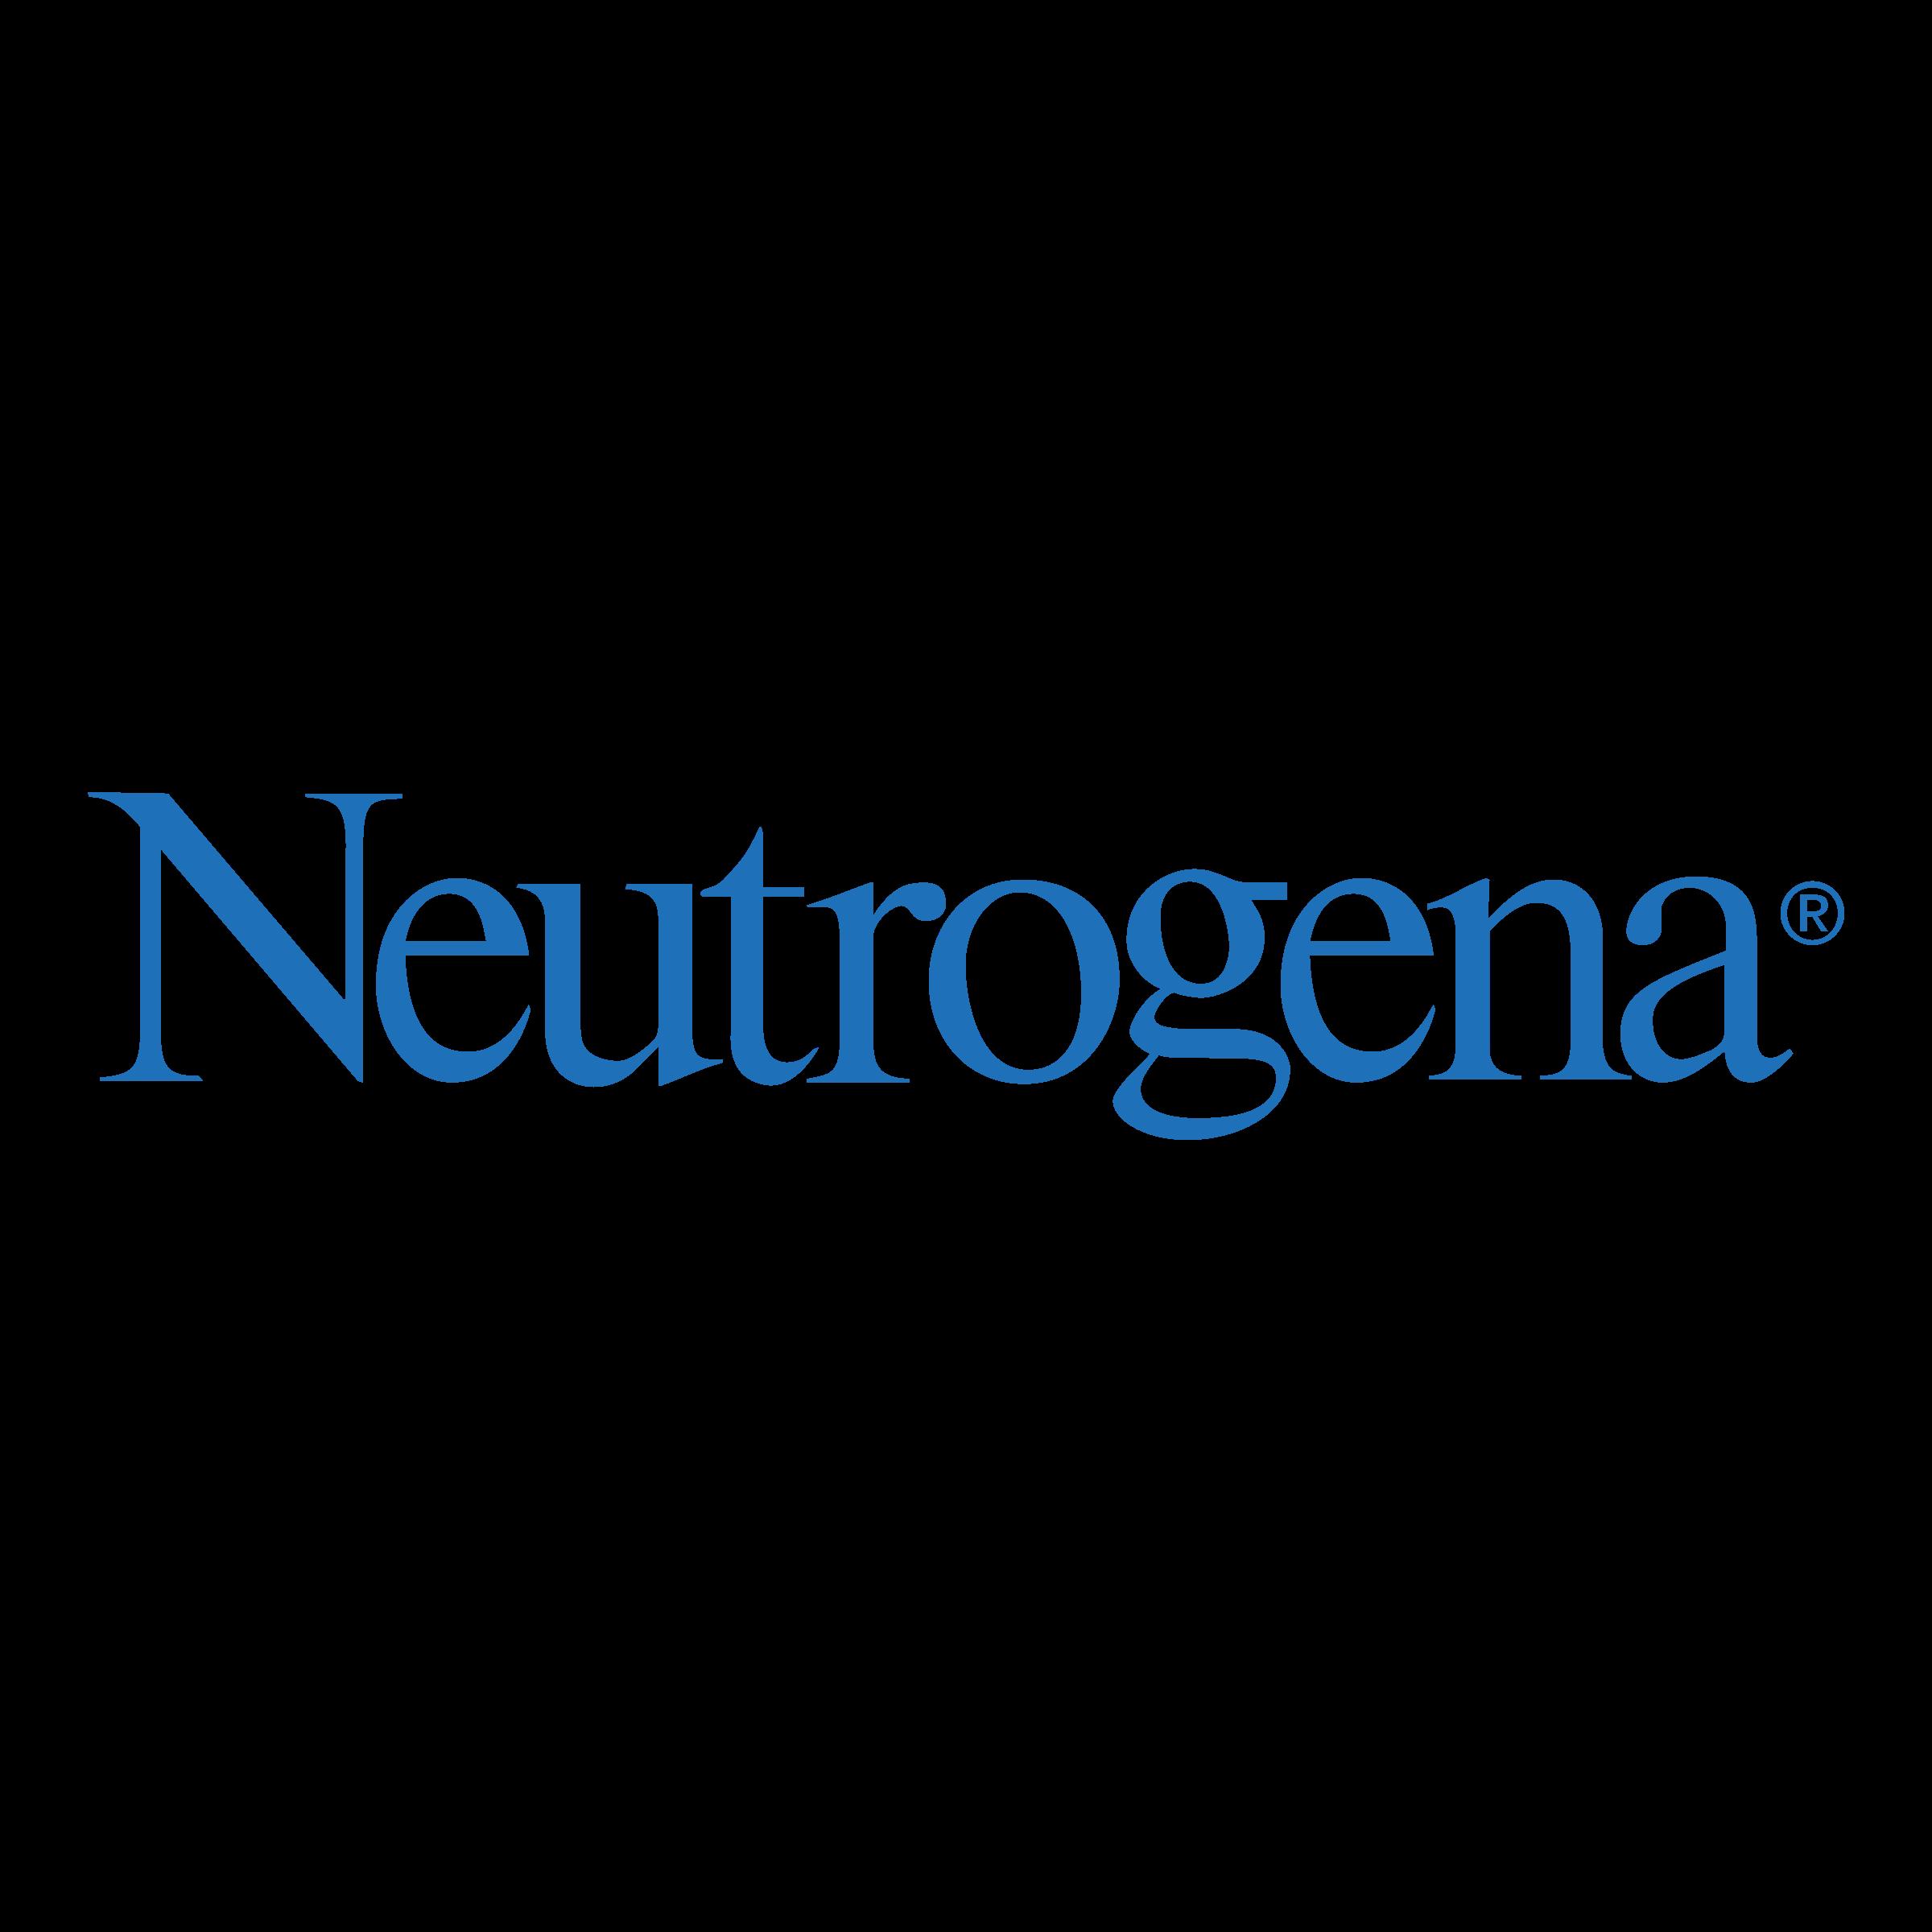 neutrogena logo png transparent amp svg vector freebie supply